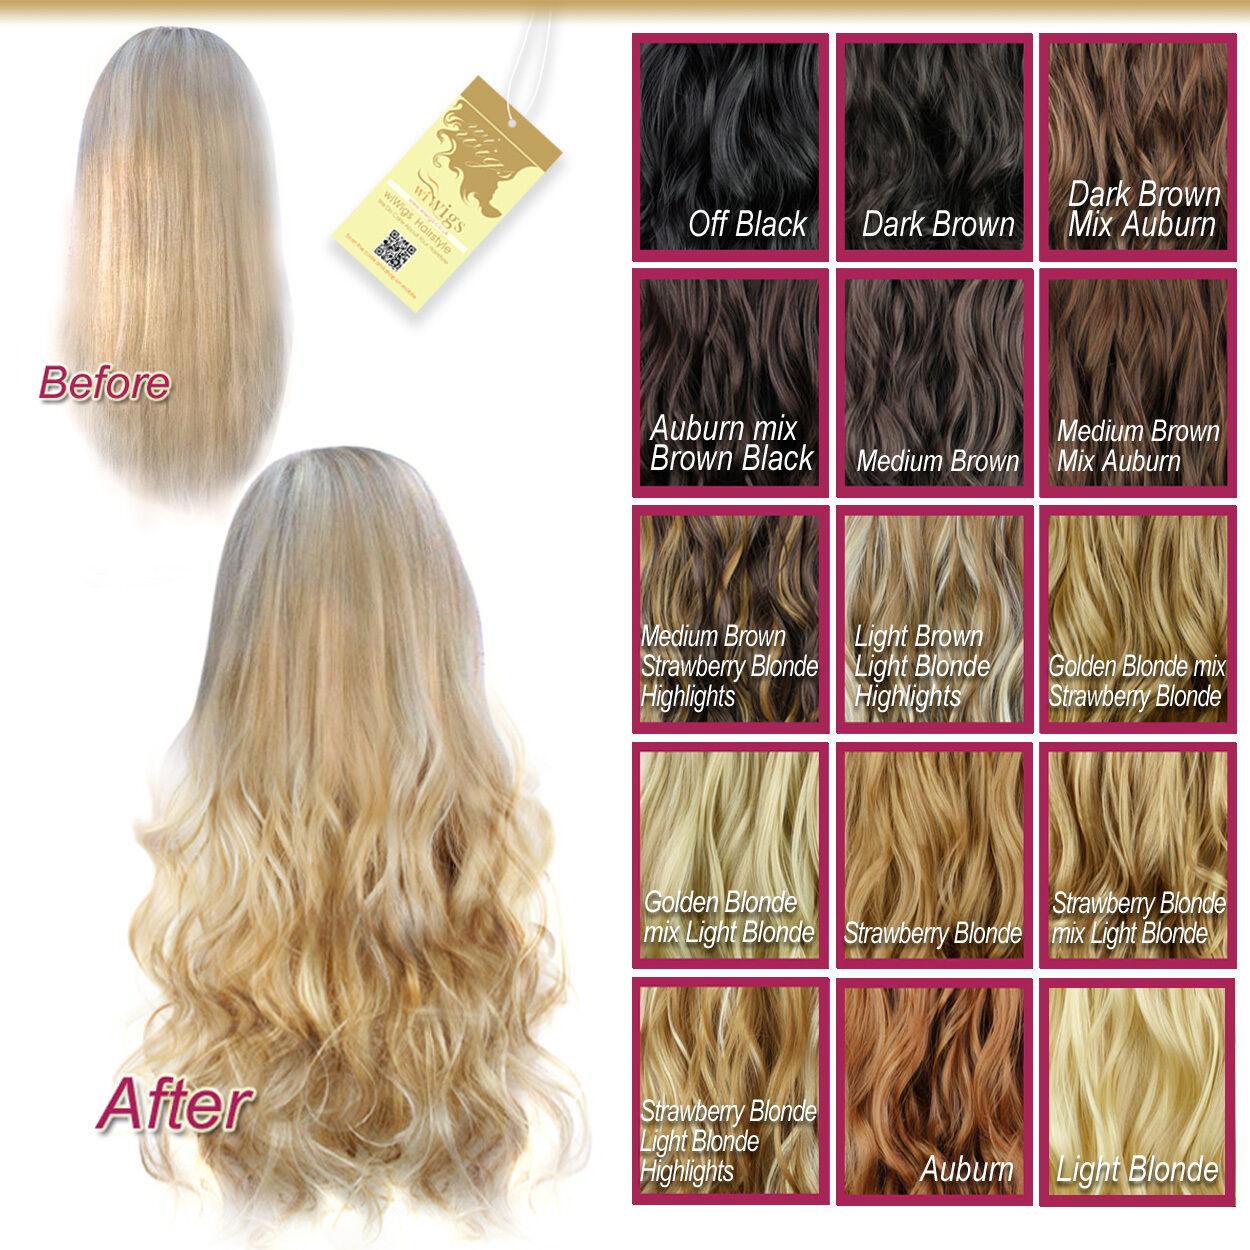 Wiwigs Curly Half Head 1 Piece Blonde Brown Auburn Black Clip In